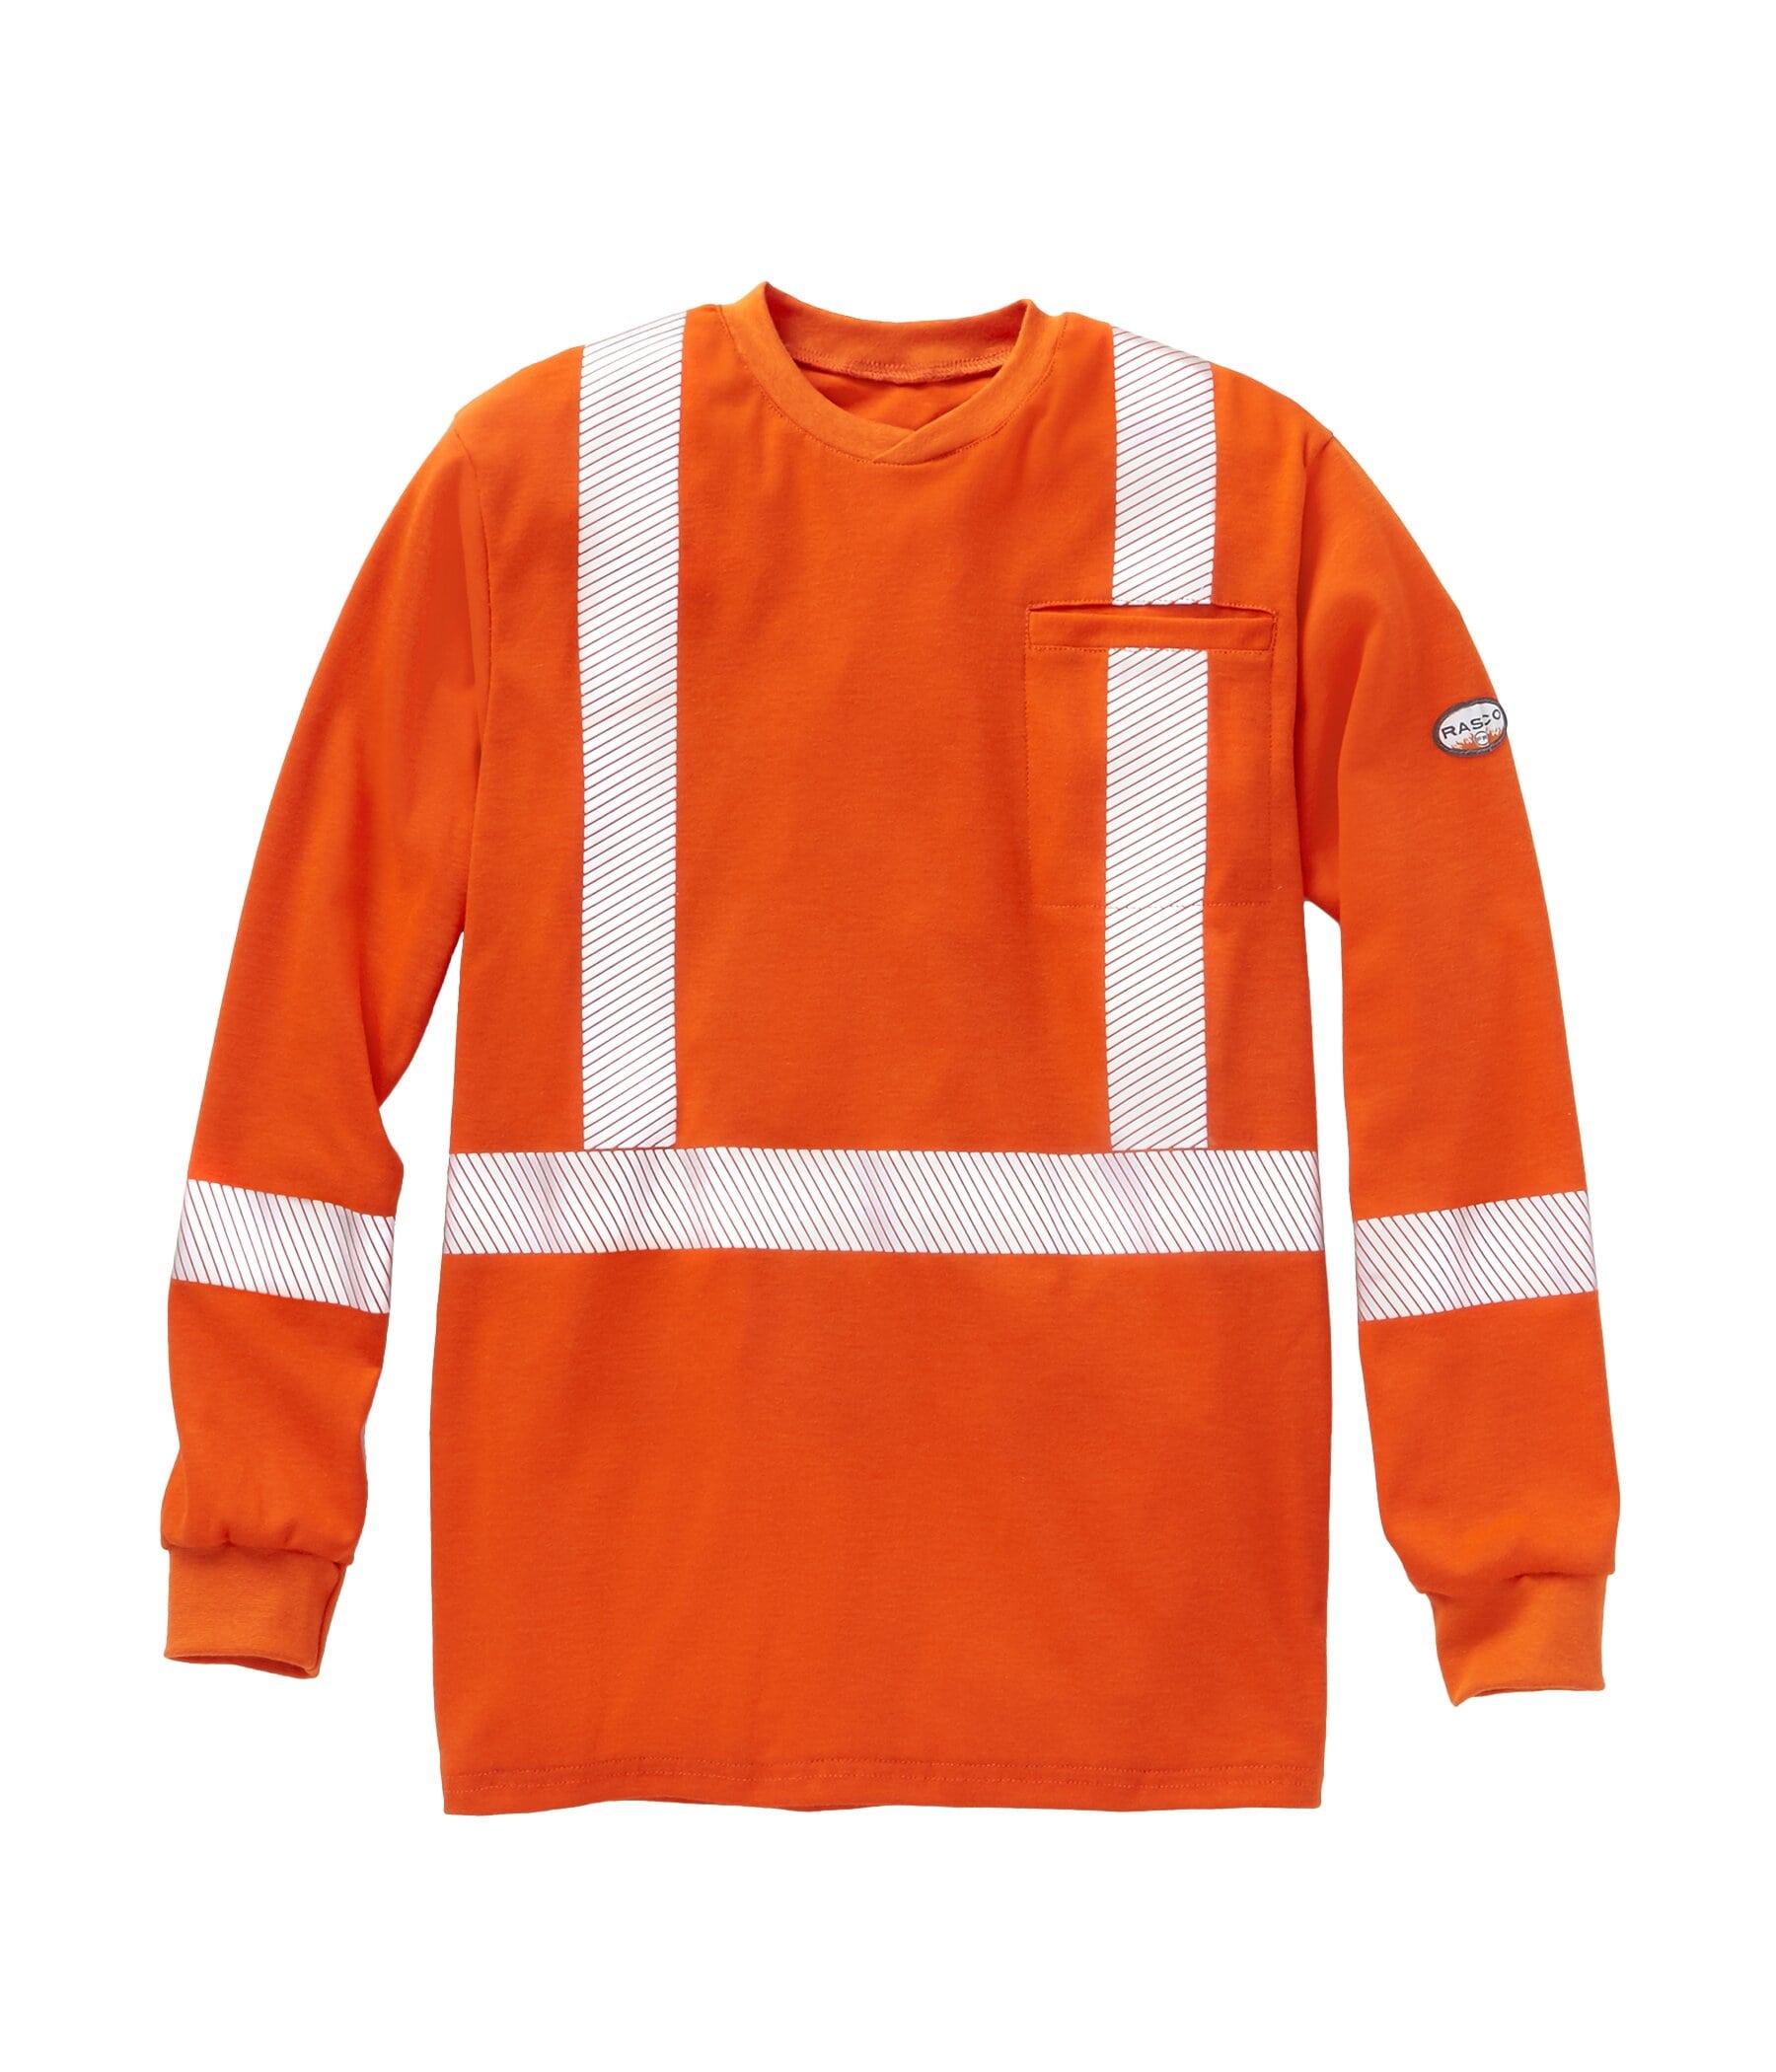 FR Hi Vis UltraSoft Long Sleeve Shirt with Reflective Trim